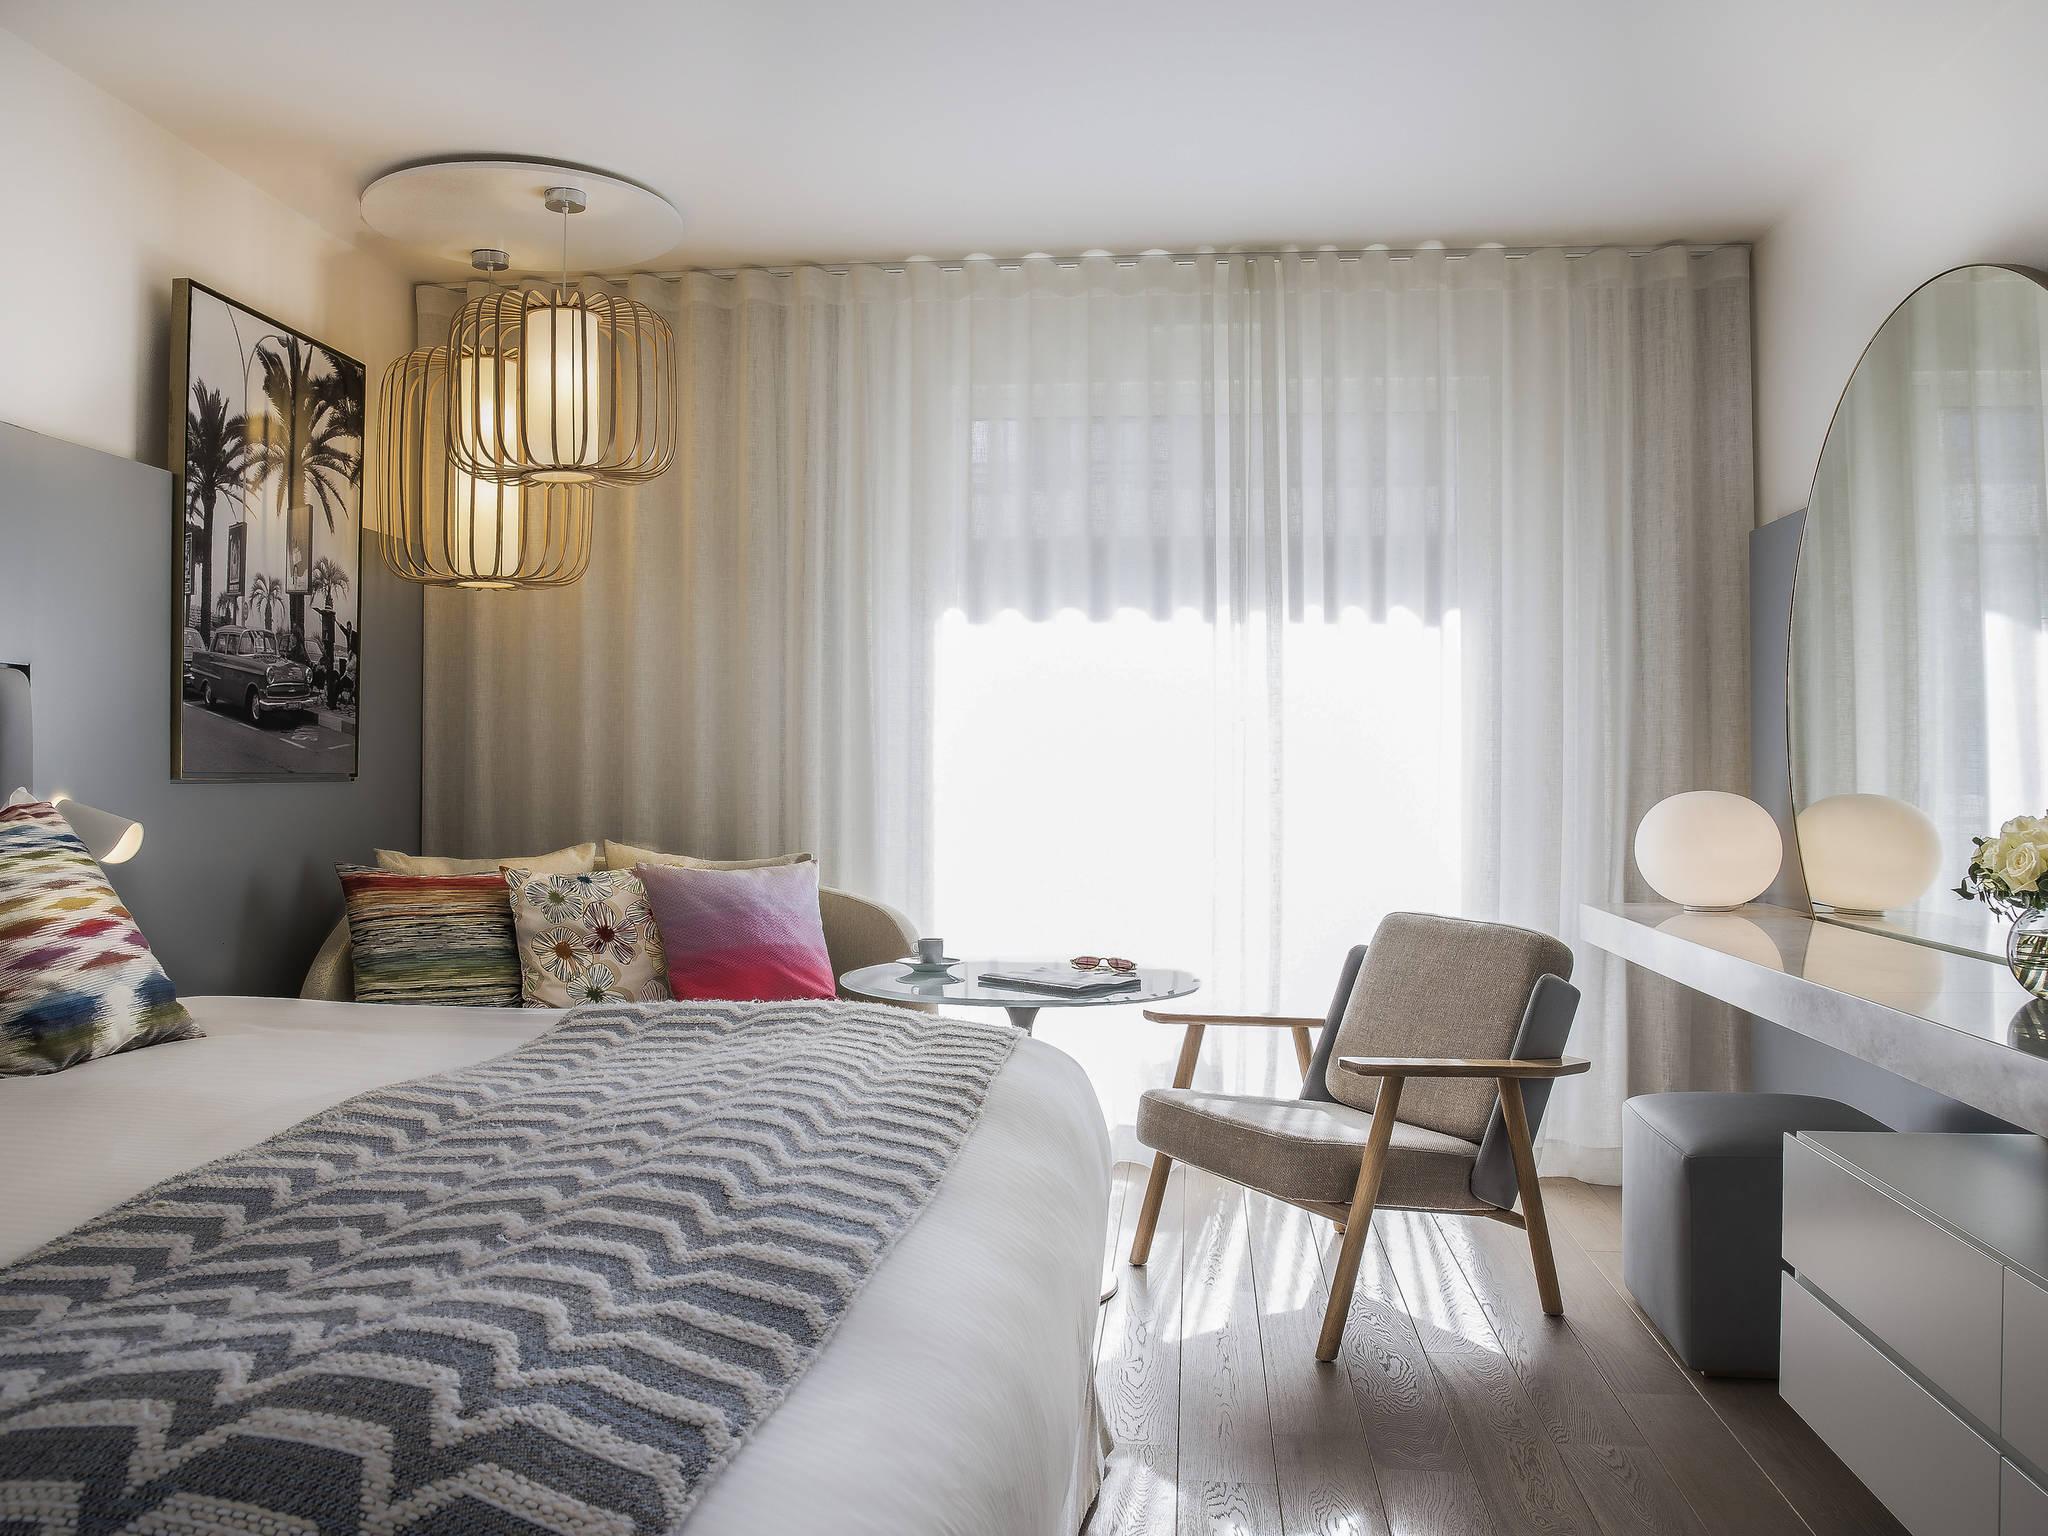 Hotel – Hotel Mercure Cannes Croisette Beach